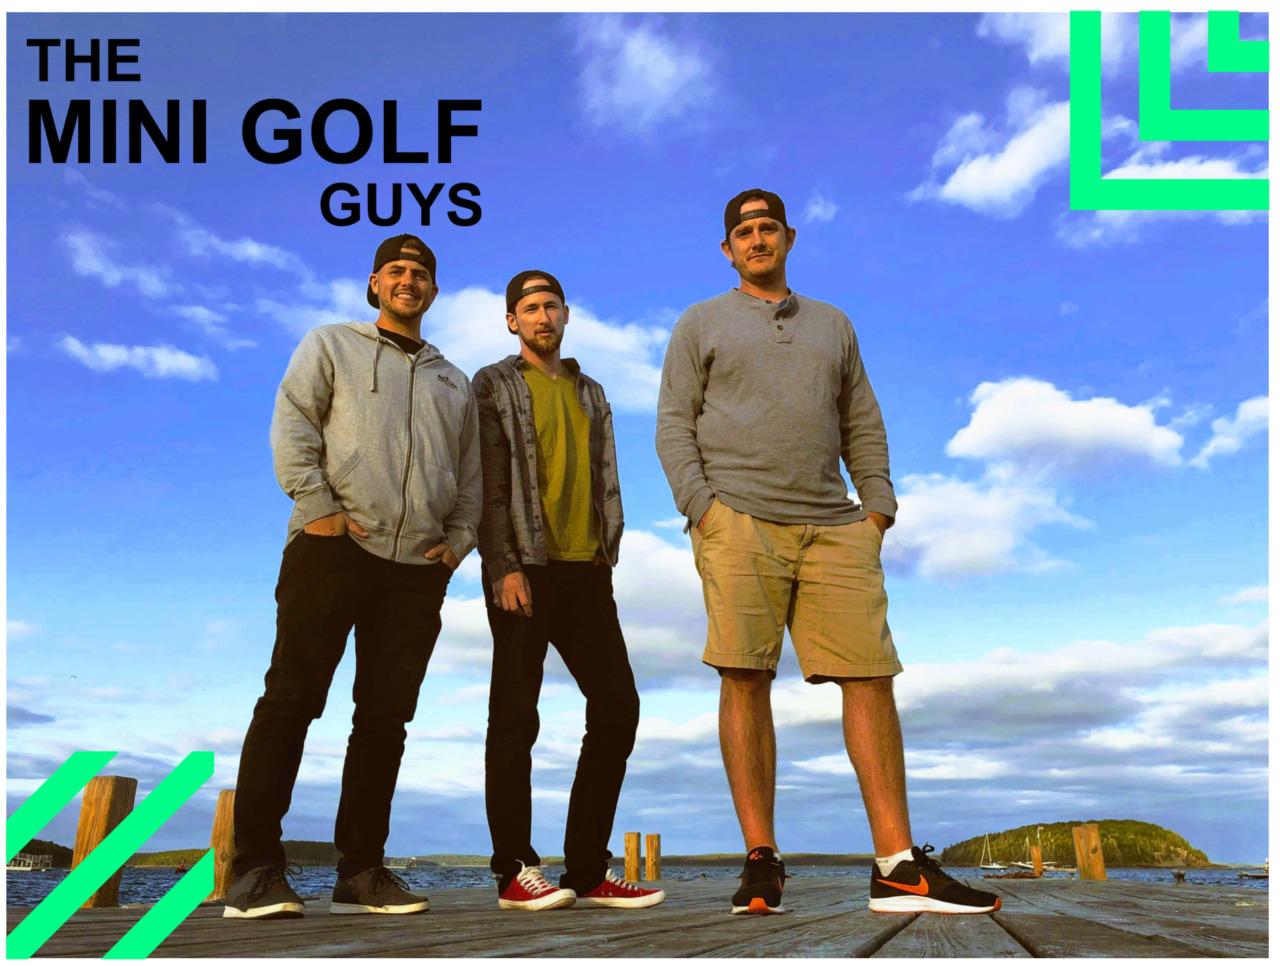 Bigs & The Mini Golf Guys